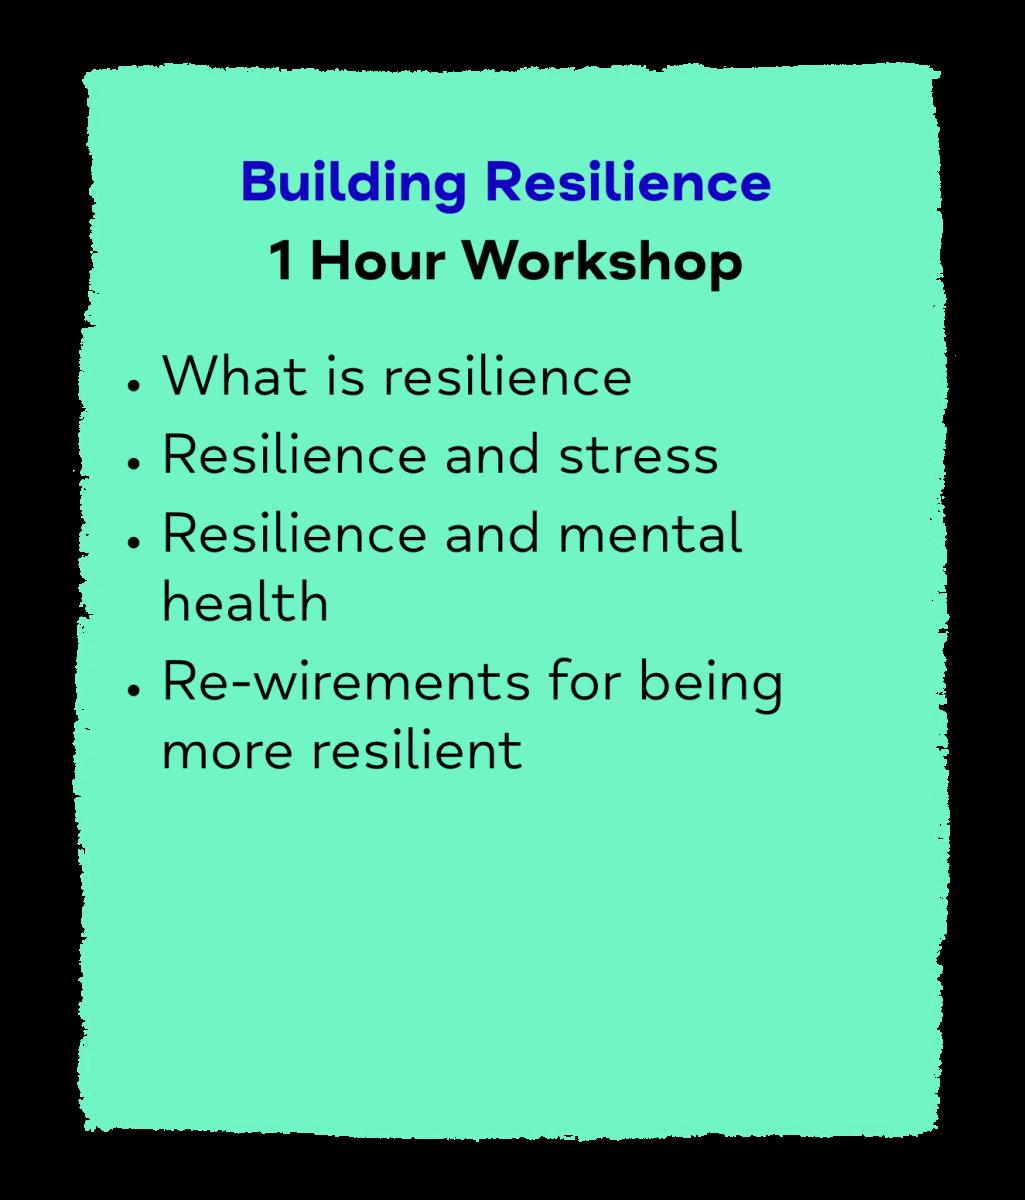 Building Resilience 1 Hour Workshop